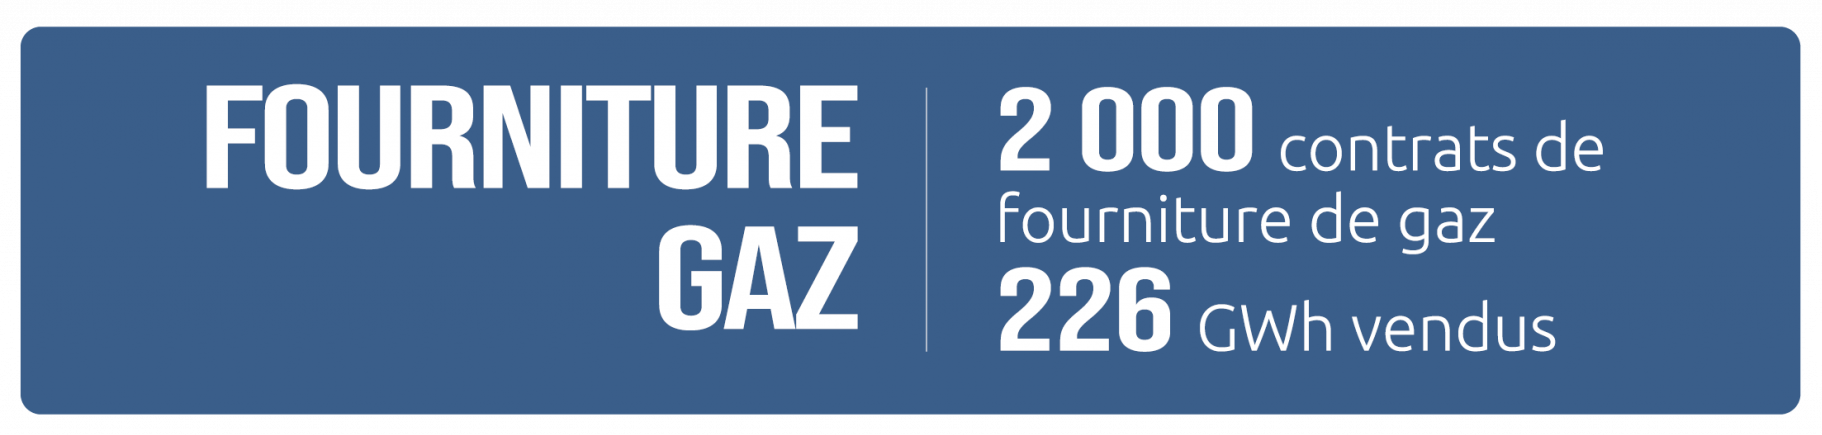 FOURNITURE GAZ 2021